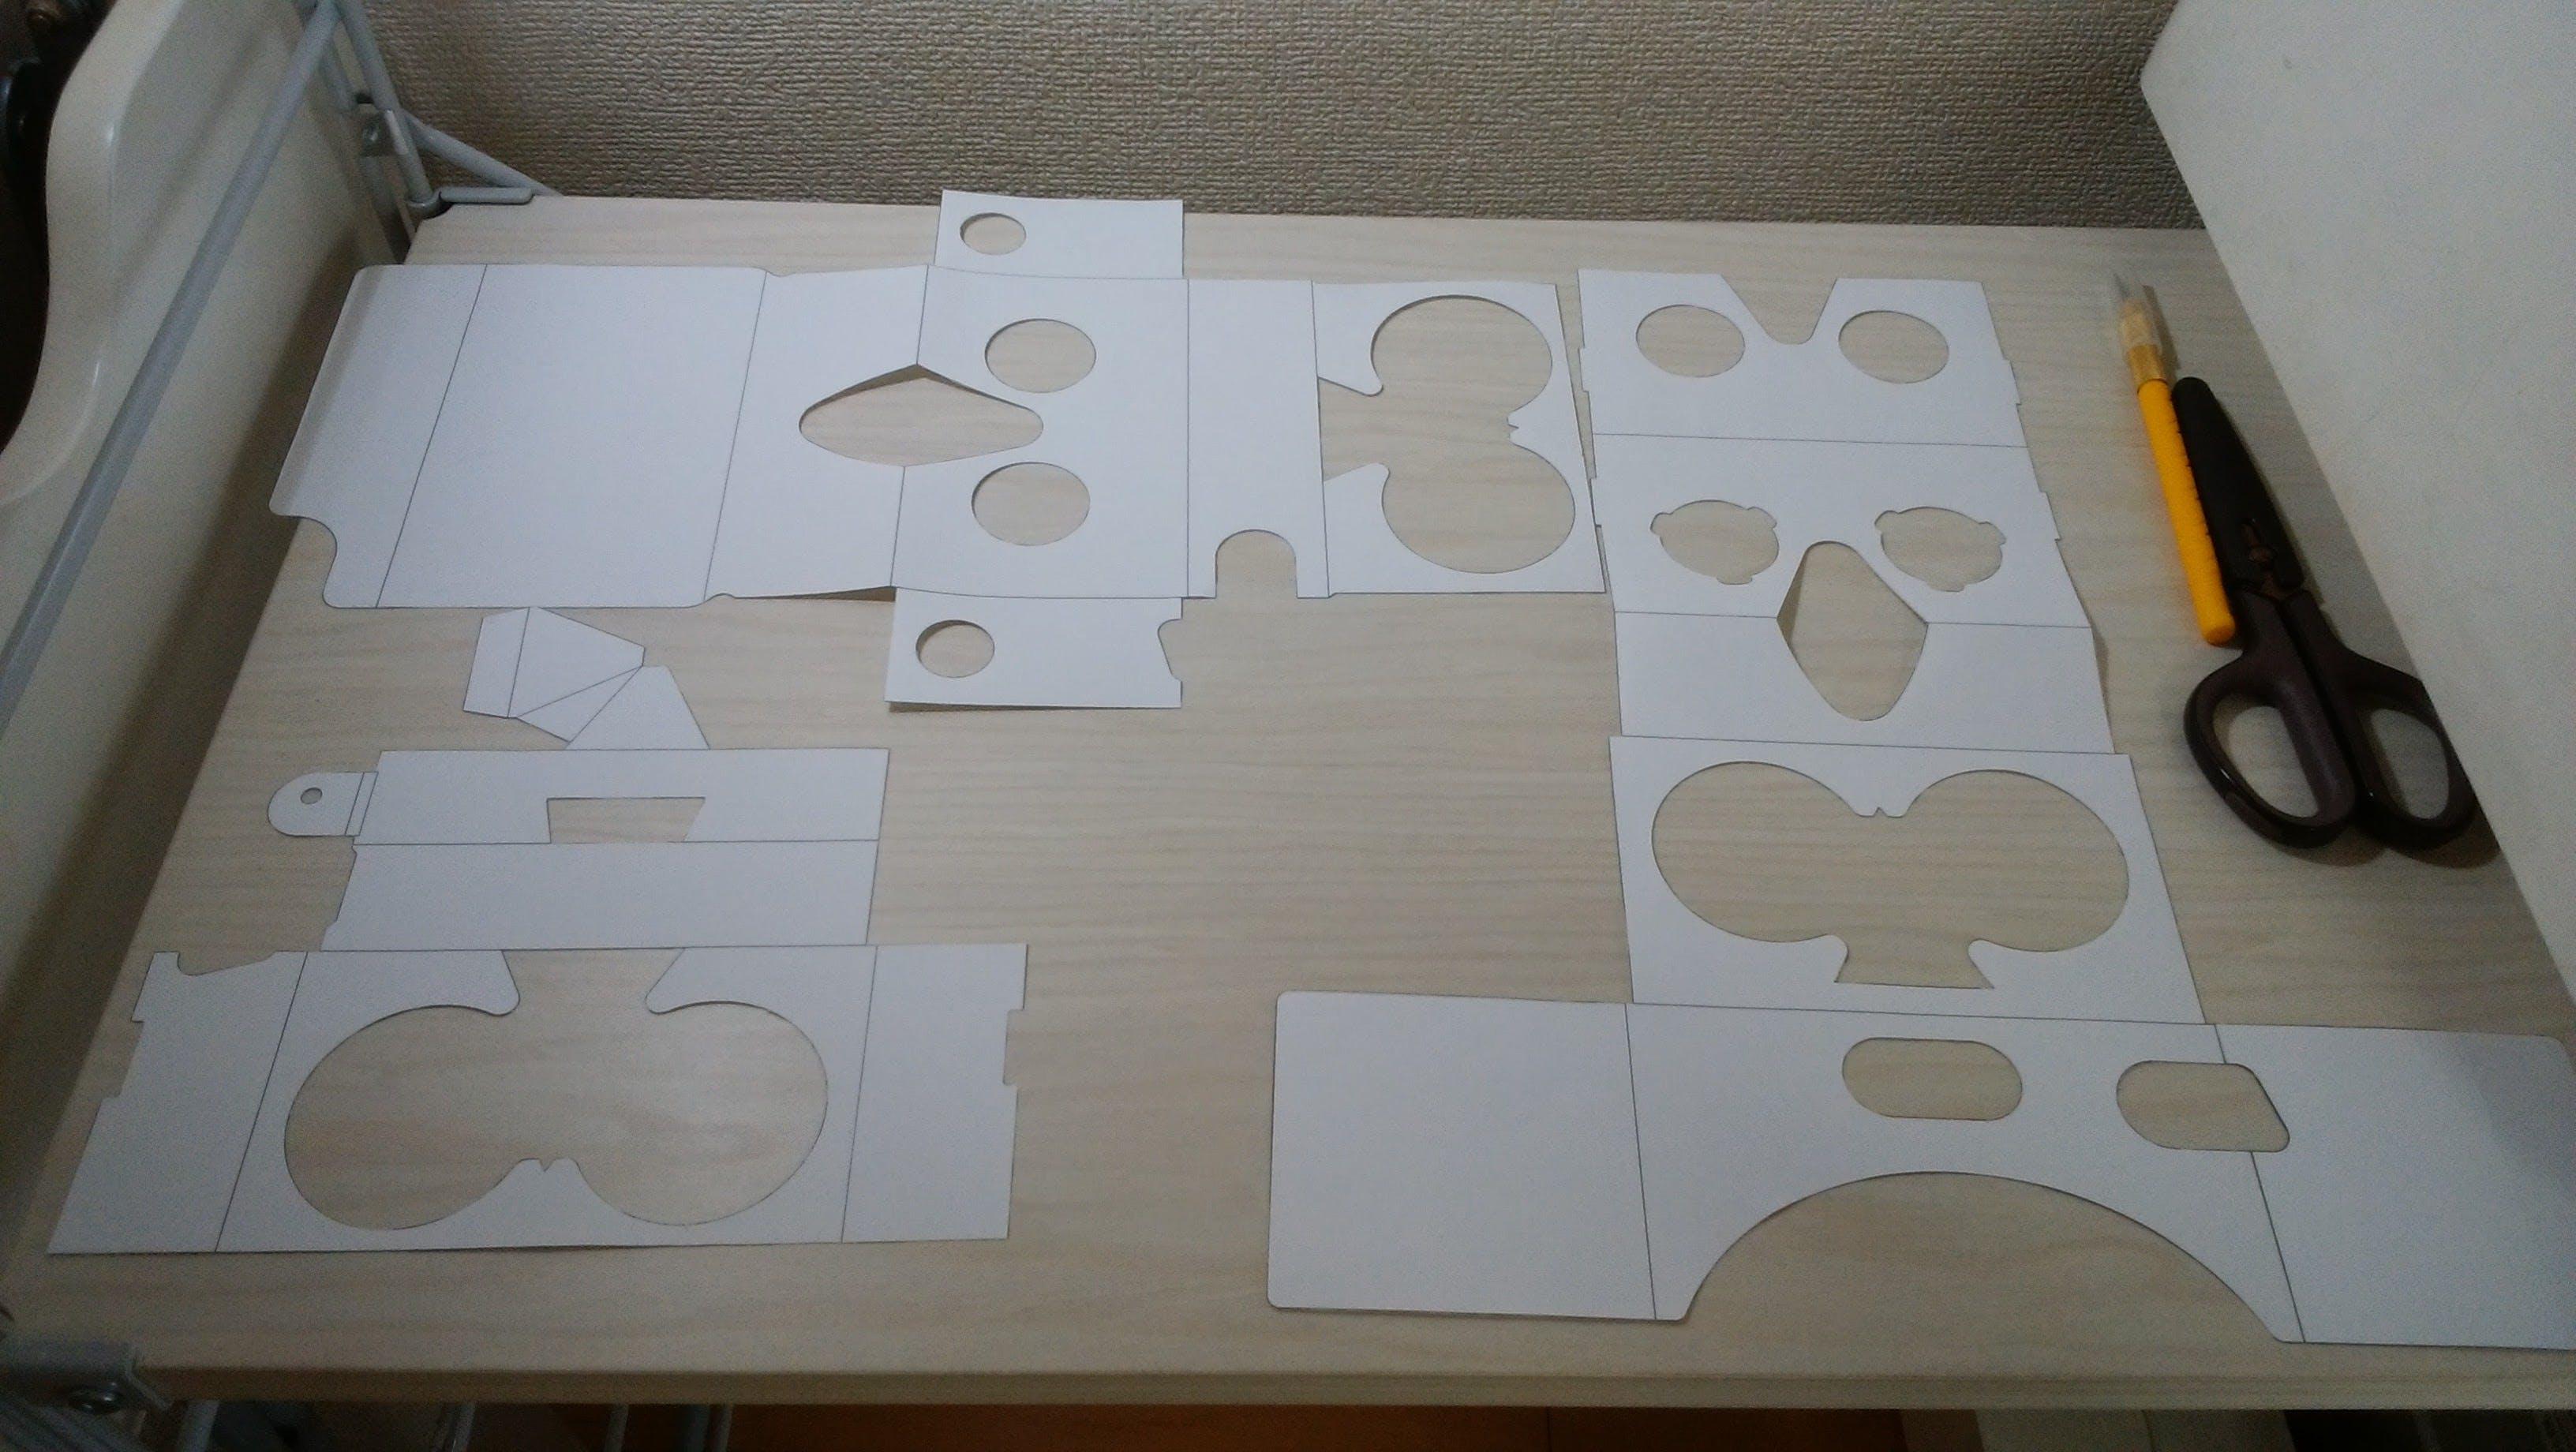 Google Cardboardを最新の設計図で自作する方法 Qiita